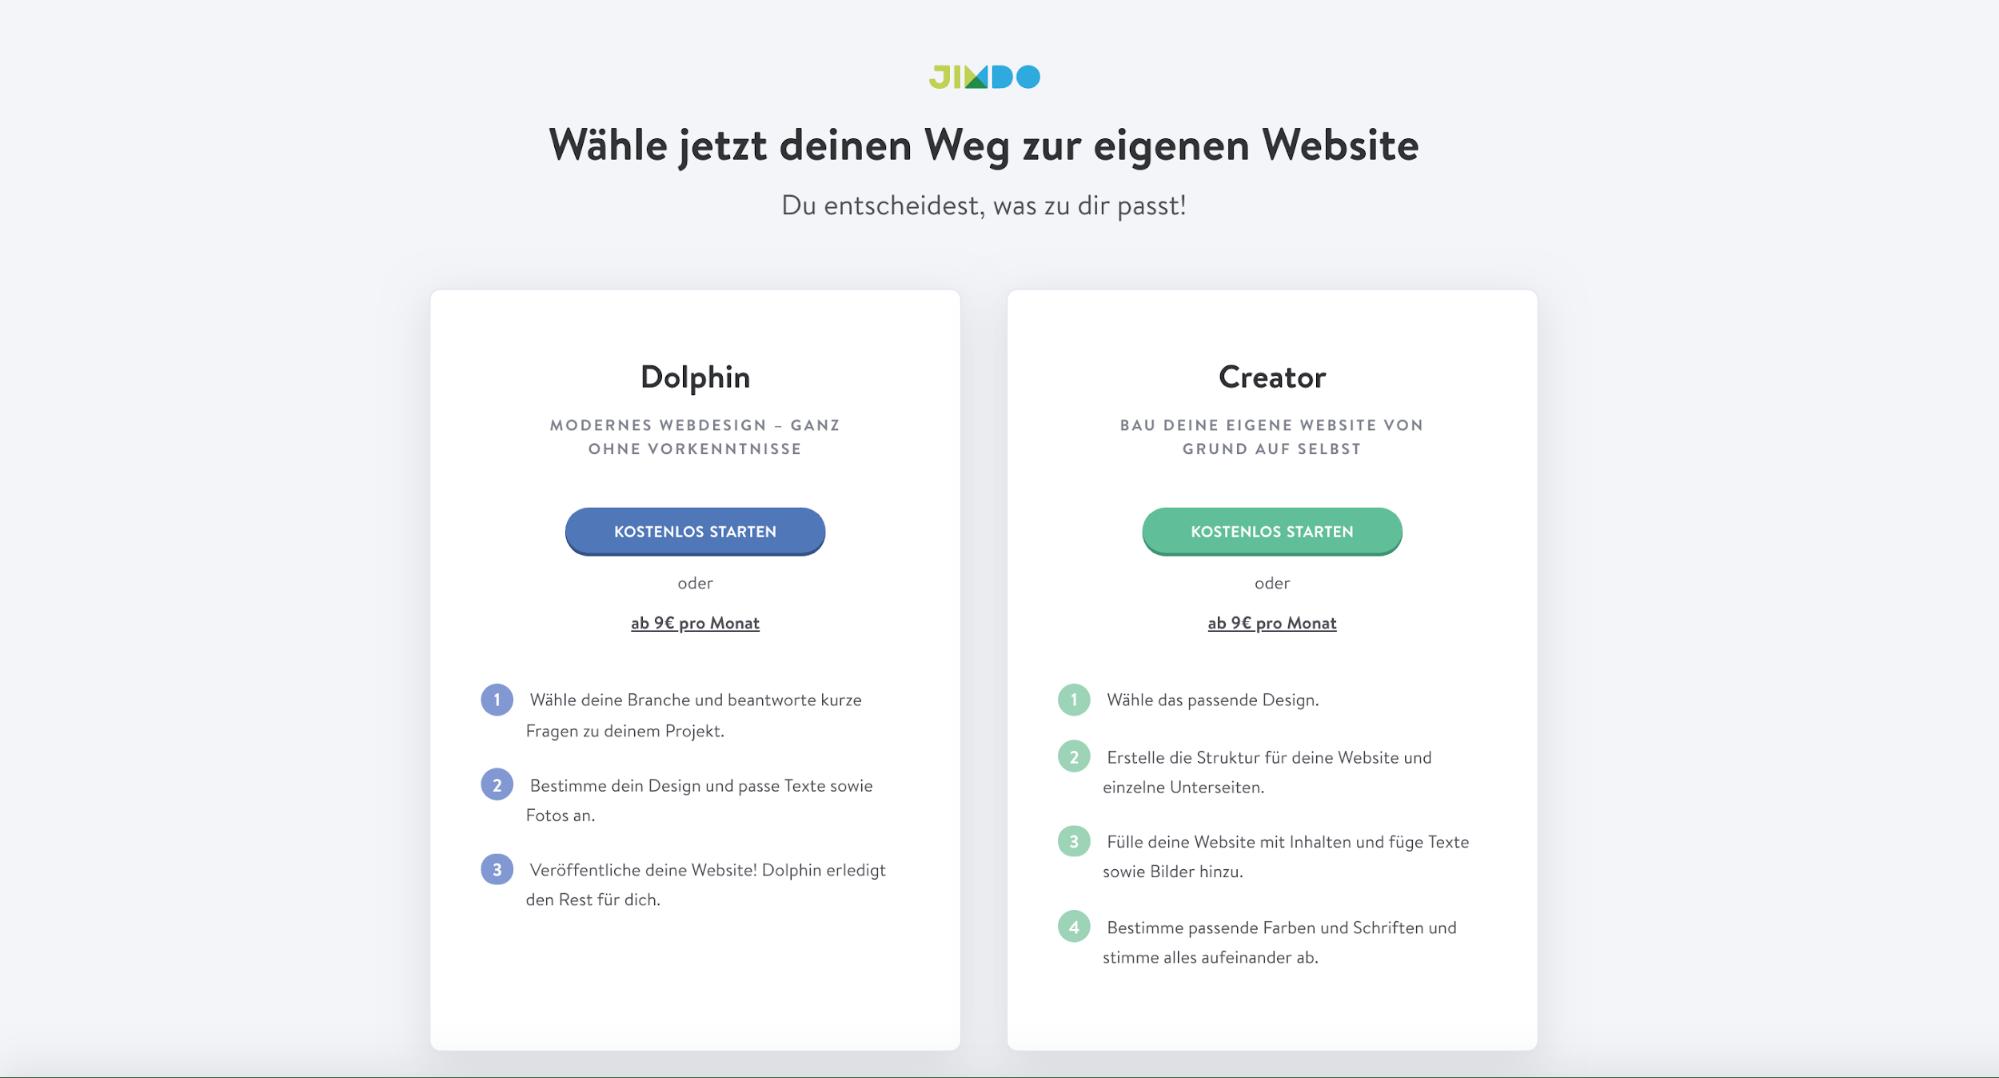 Website erstellen mit Mac (Webdesign): Jimdo Schritt 1